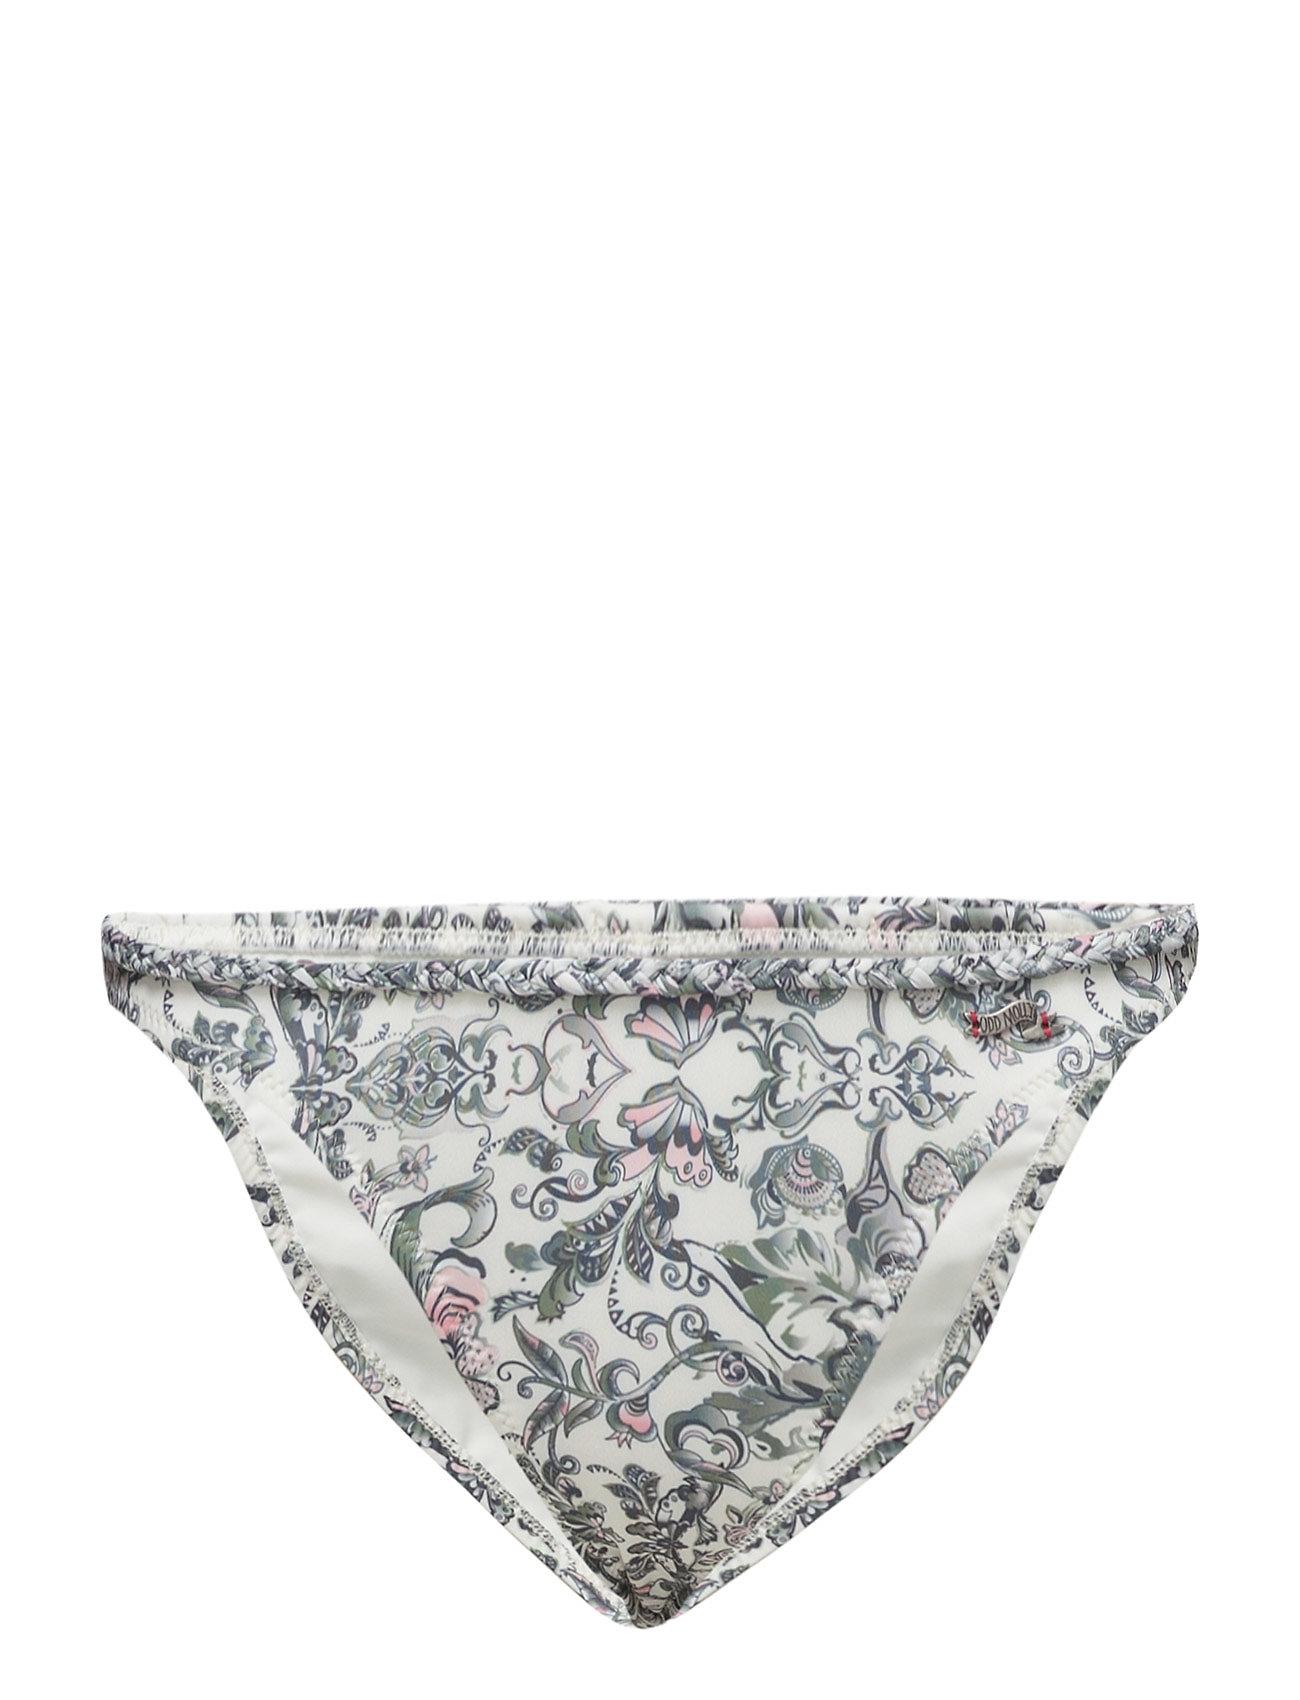 Goosebumps bikini bottom fra odd molly underwear & swimwear på boozt.com dk